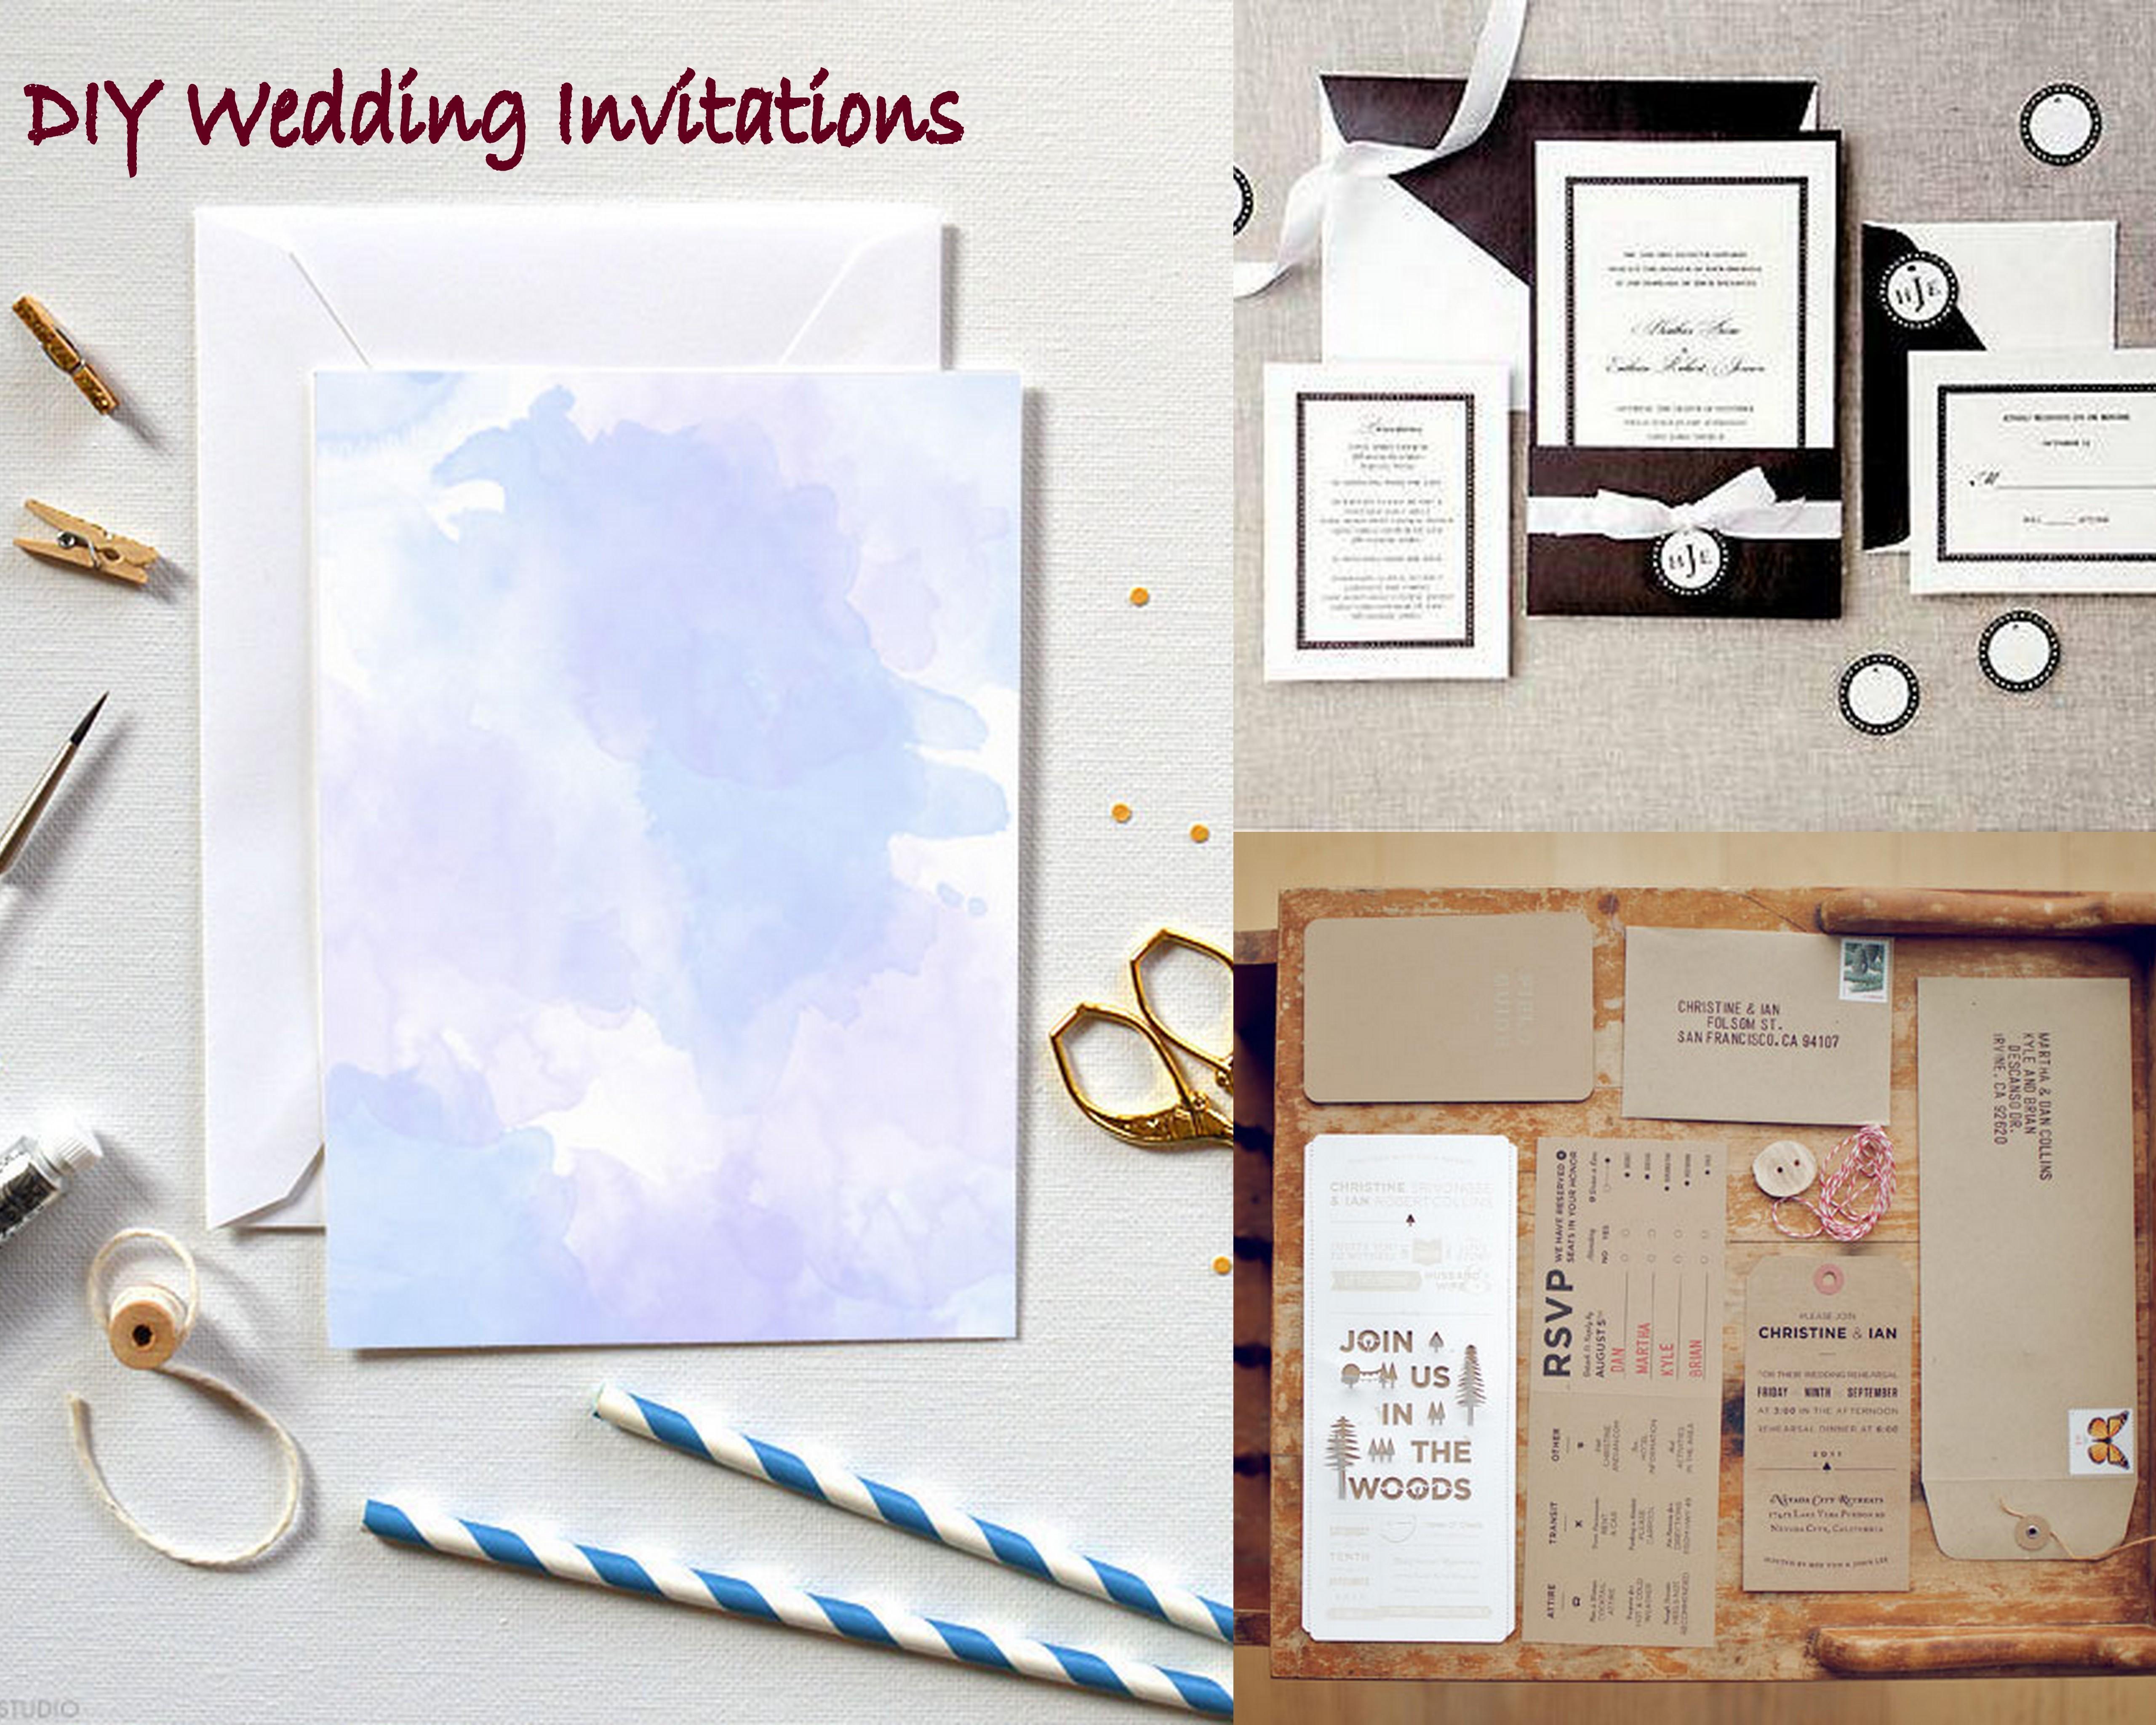 how to make use of do it yourself diy wedding invitation kit wedding invitation kit A2ZWeddingcards DIY Wedding Kit